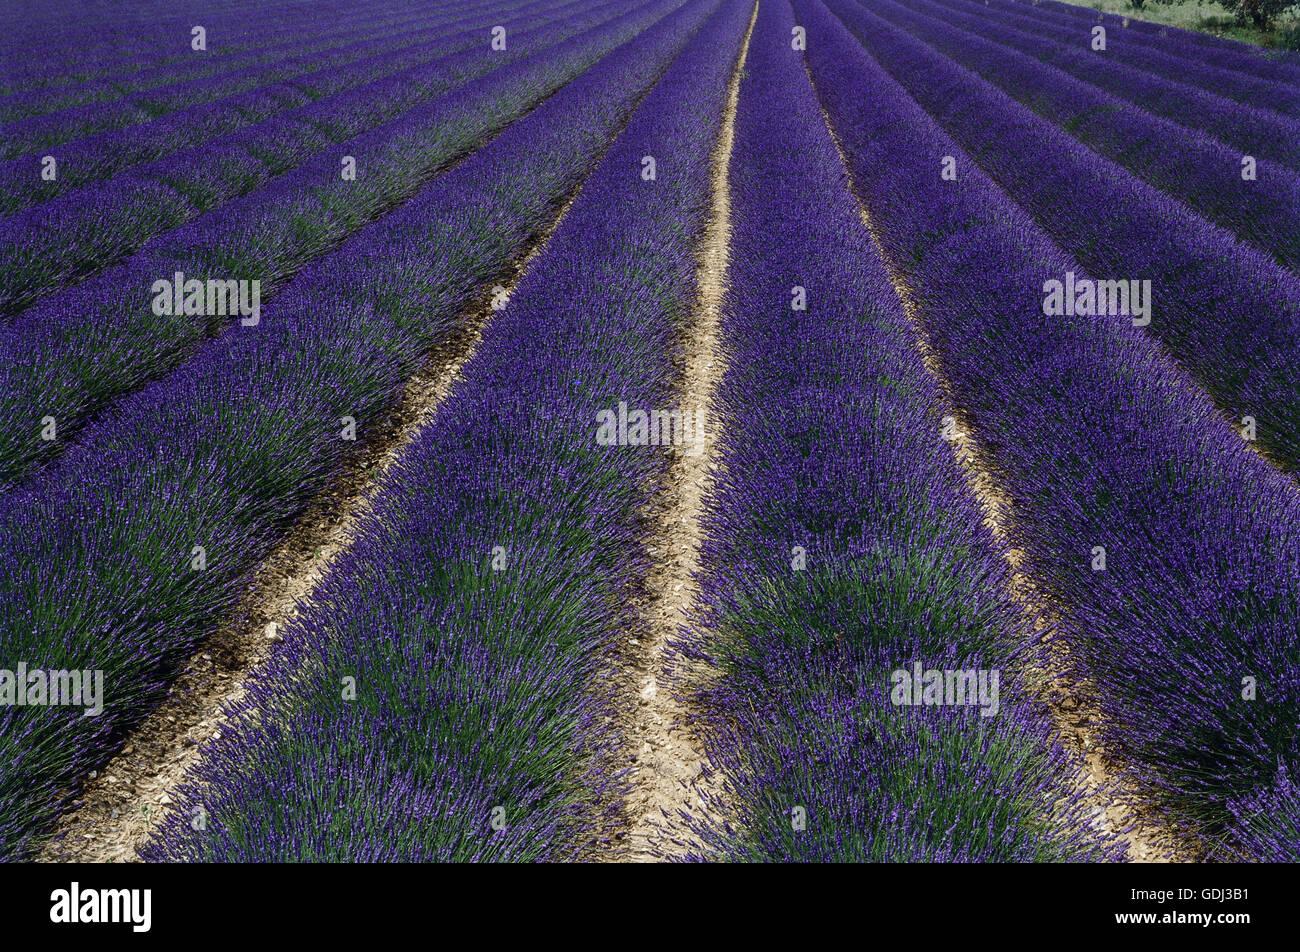 Botanik Lavendel Lavandula Angustifolia Gemeinsame Lavendel Auf Feld Gdj3b1